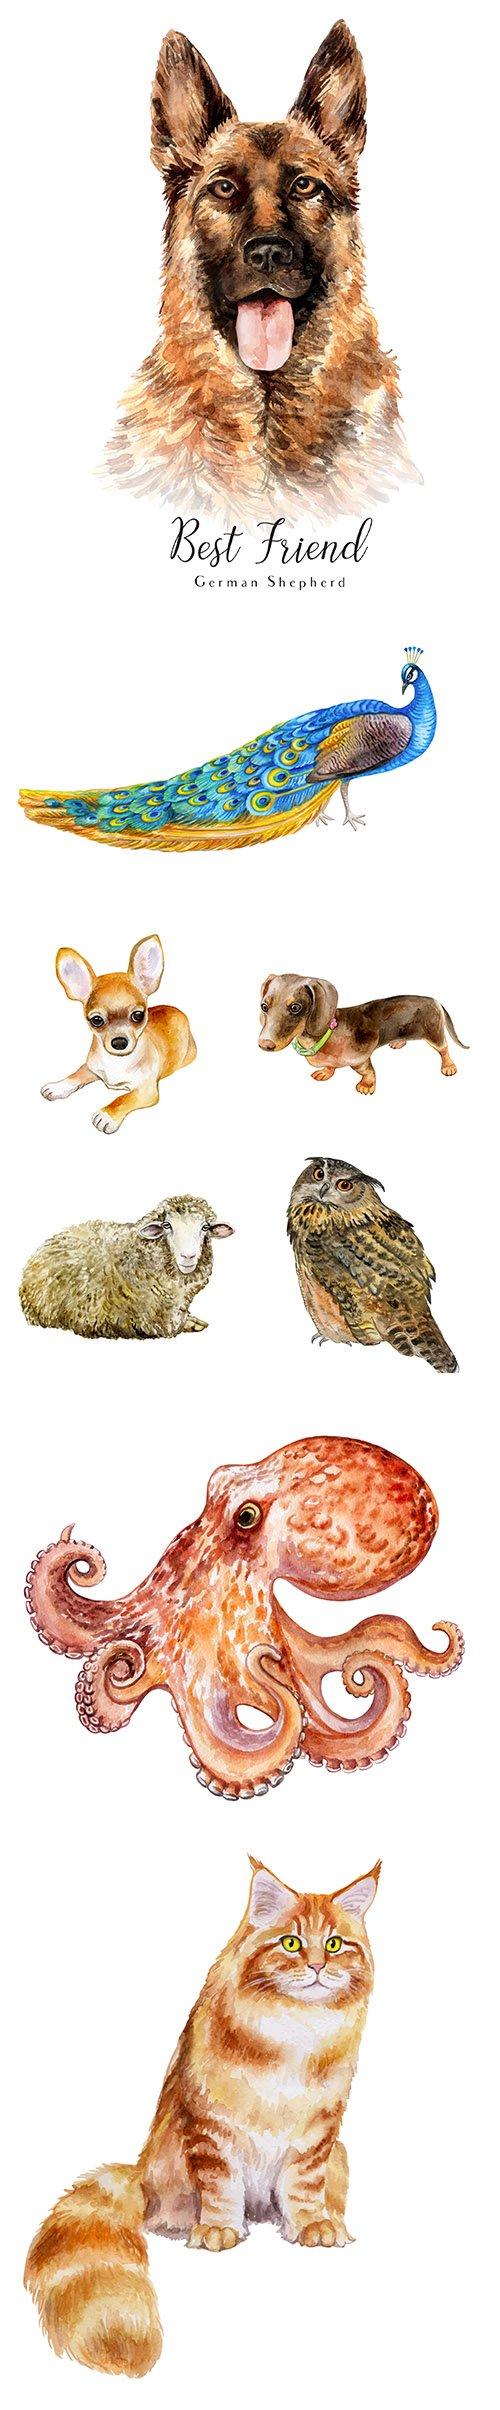 Watercolor Printing Animals Vol 9